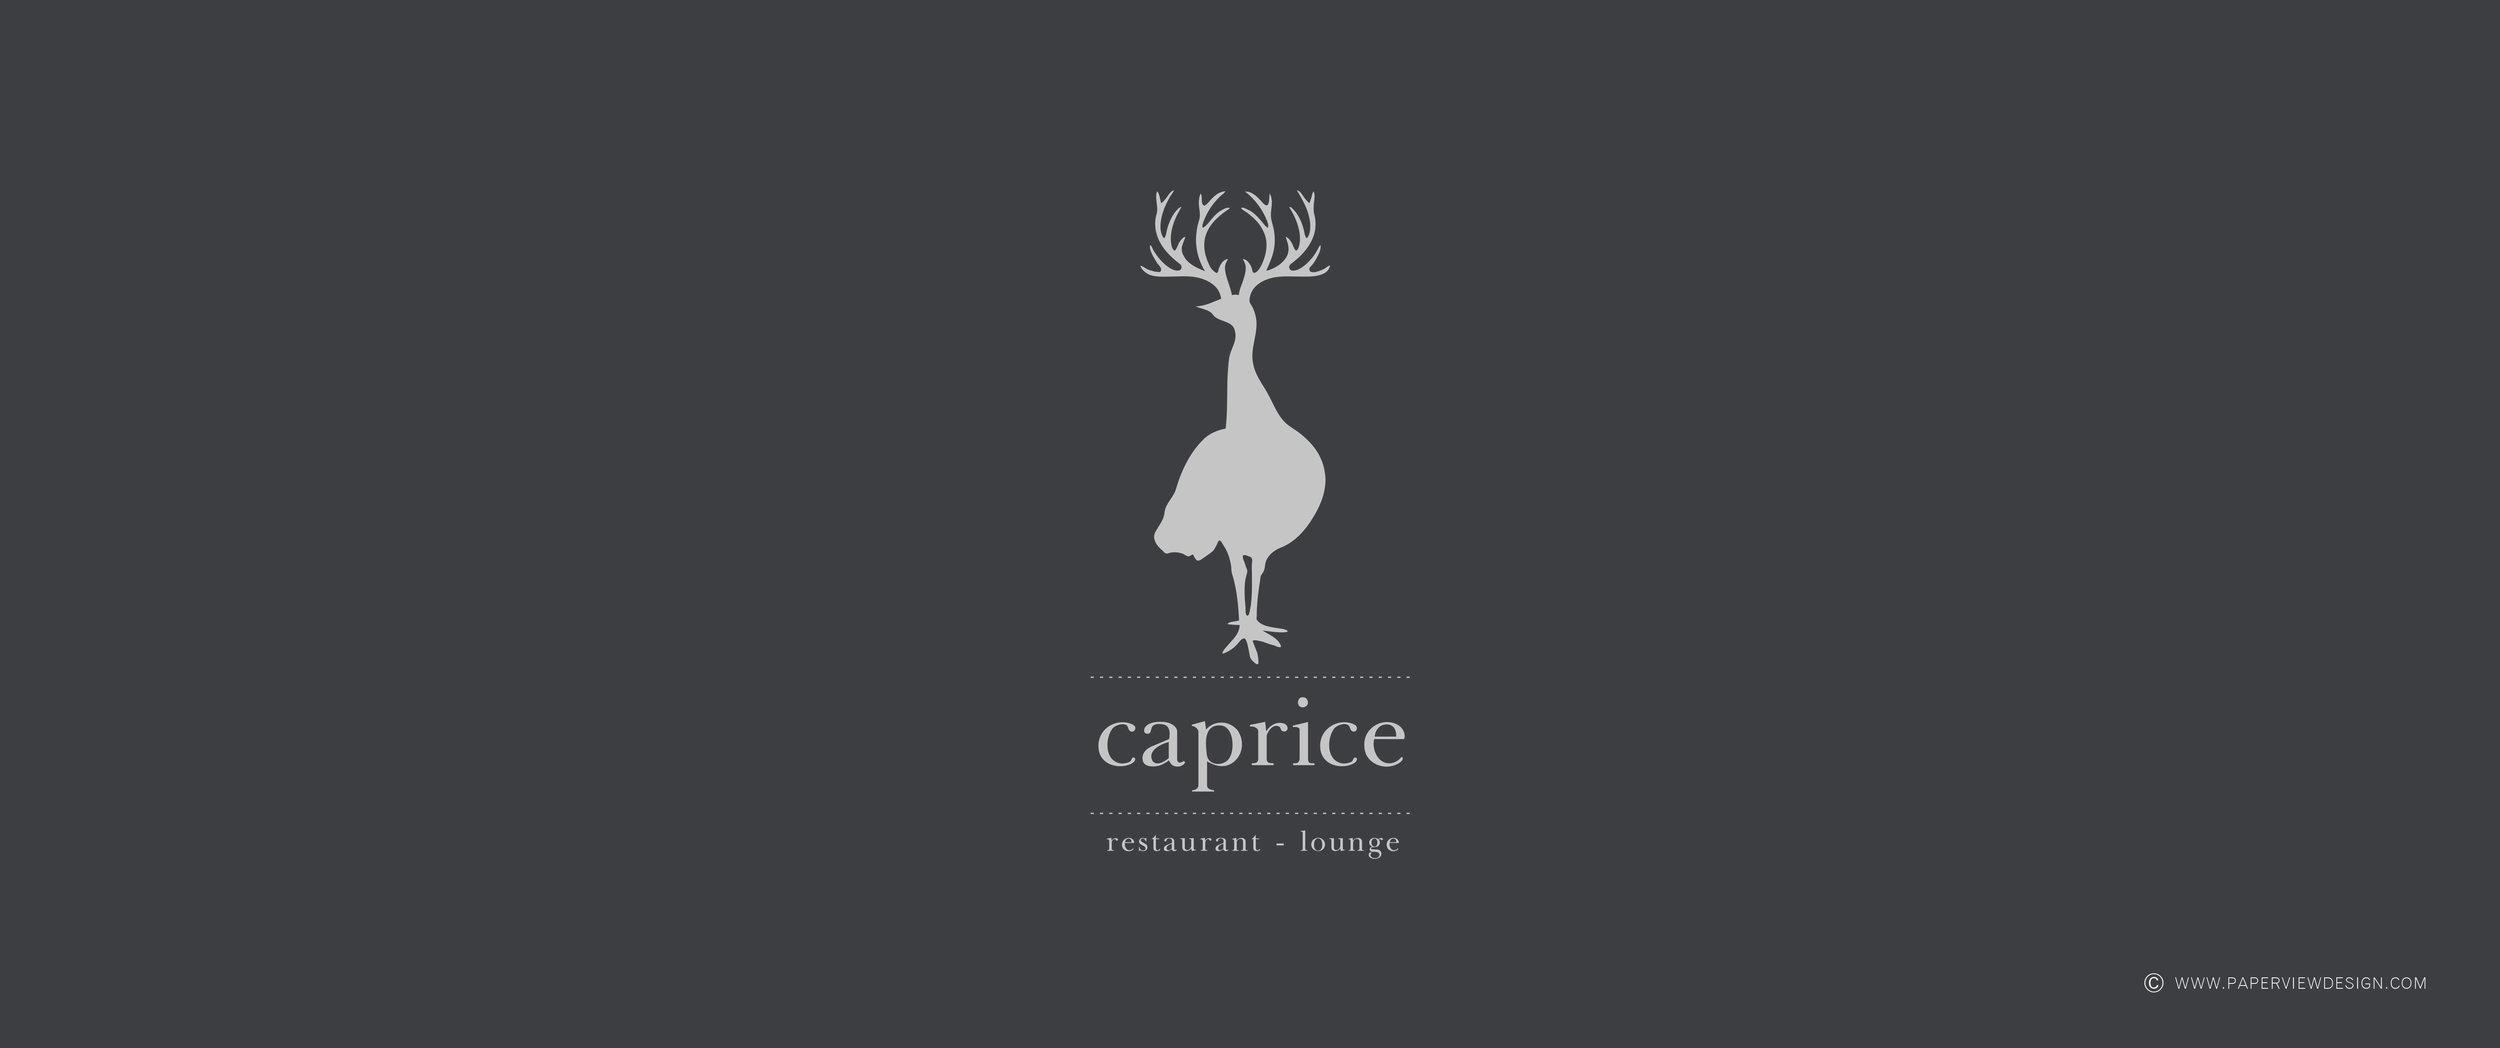 Caprice-Logo-Identity-Bar-NightClub-Restaurant-Lounge